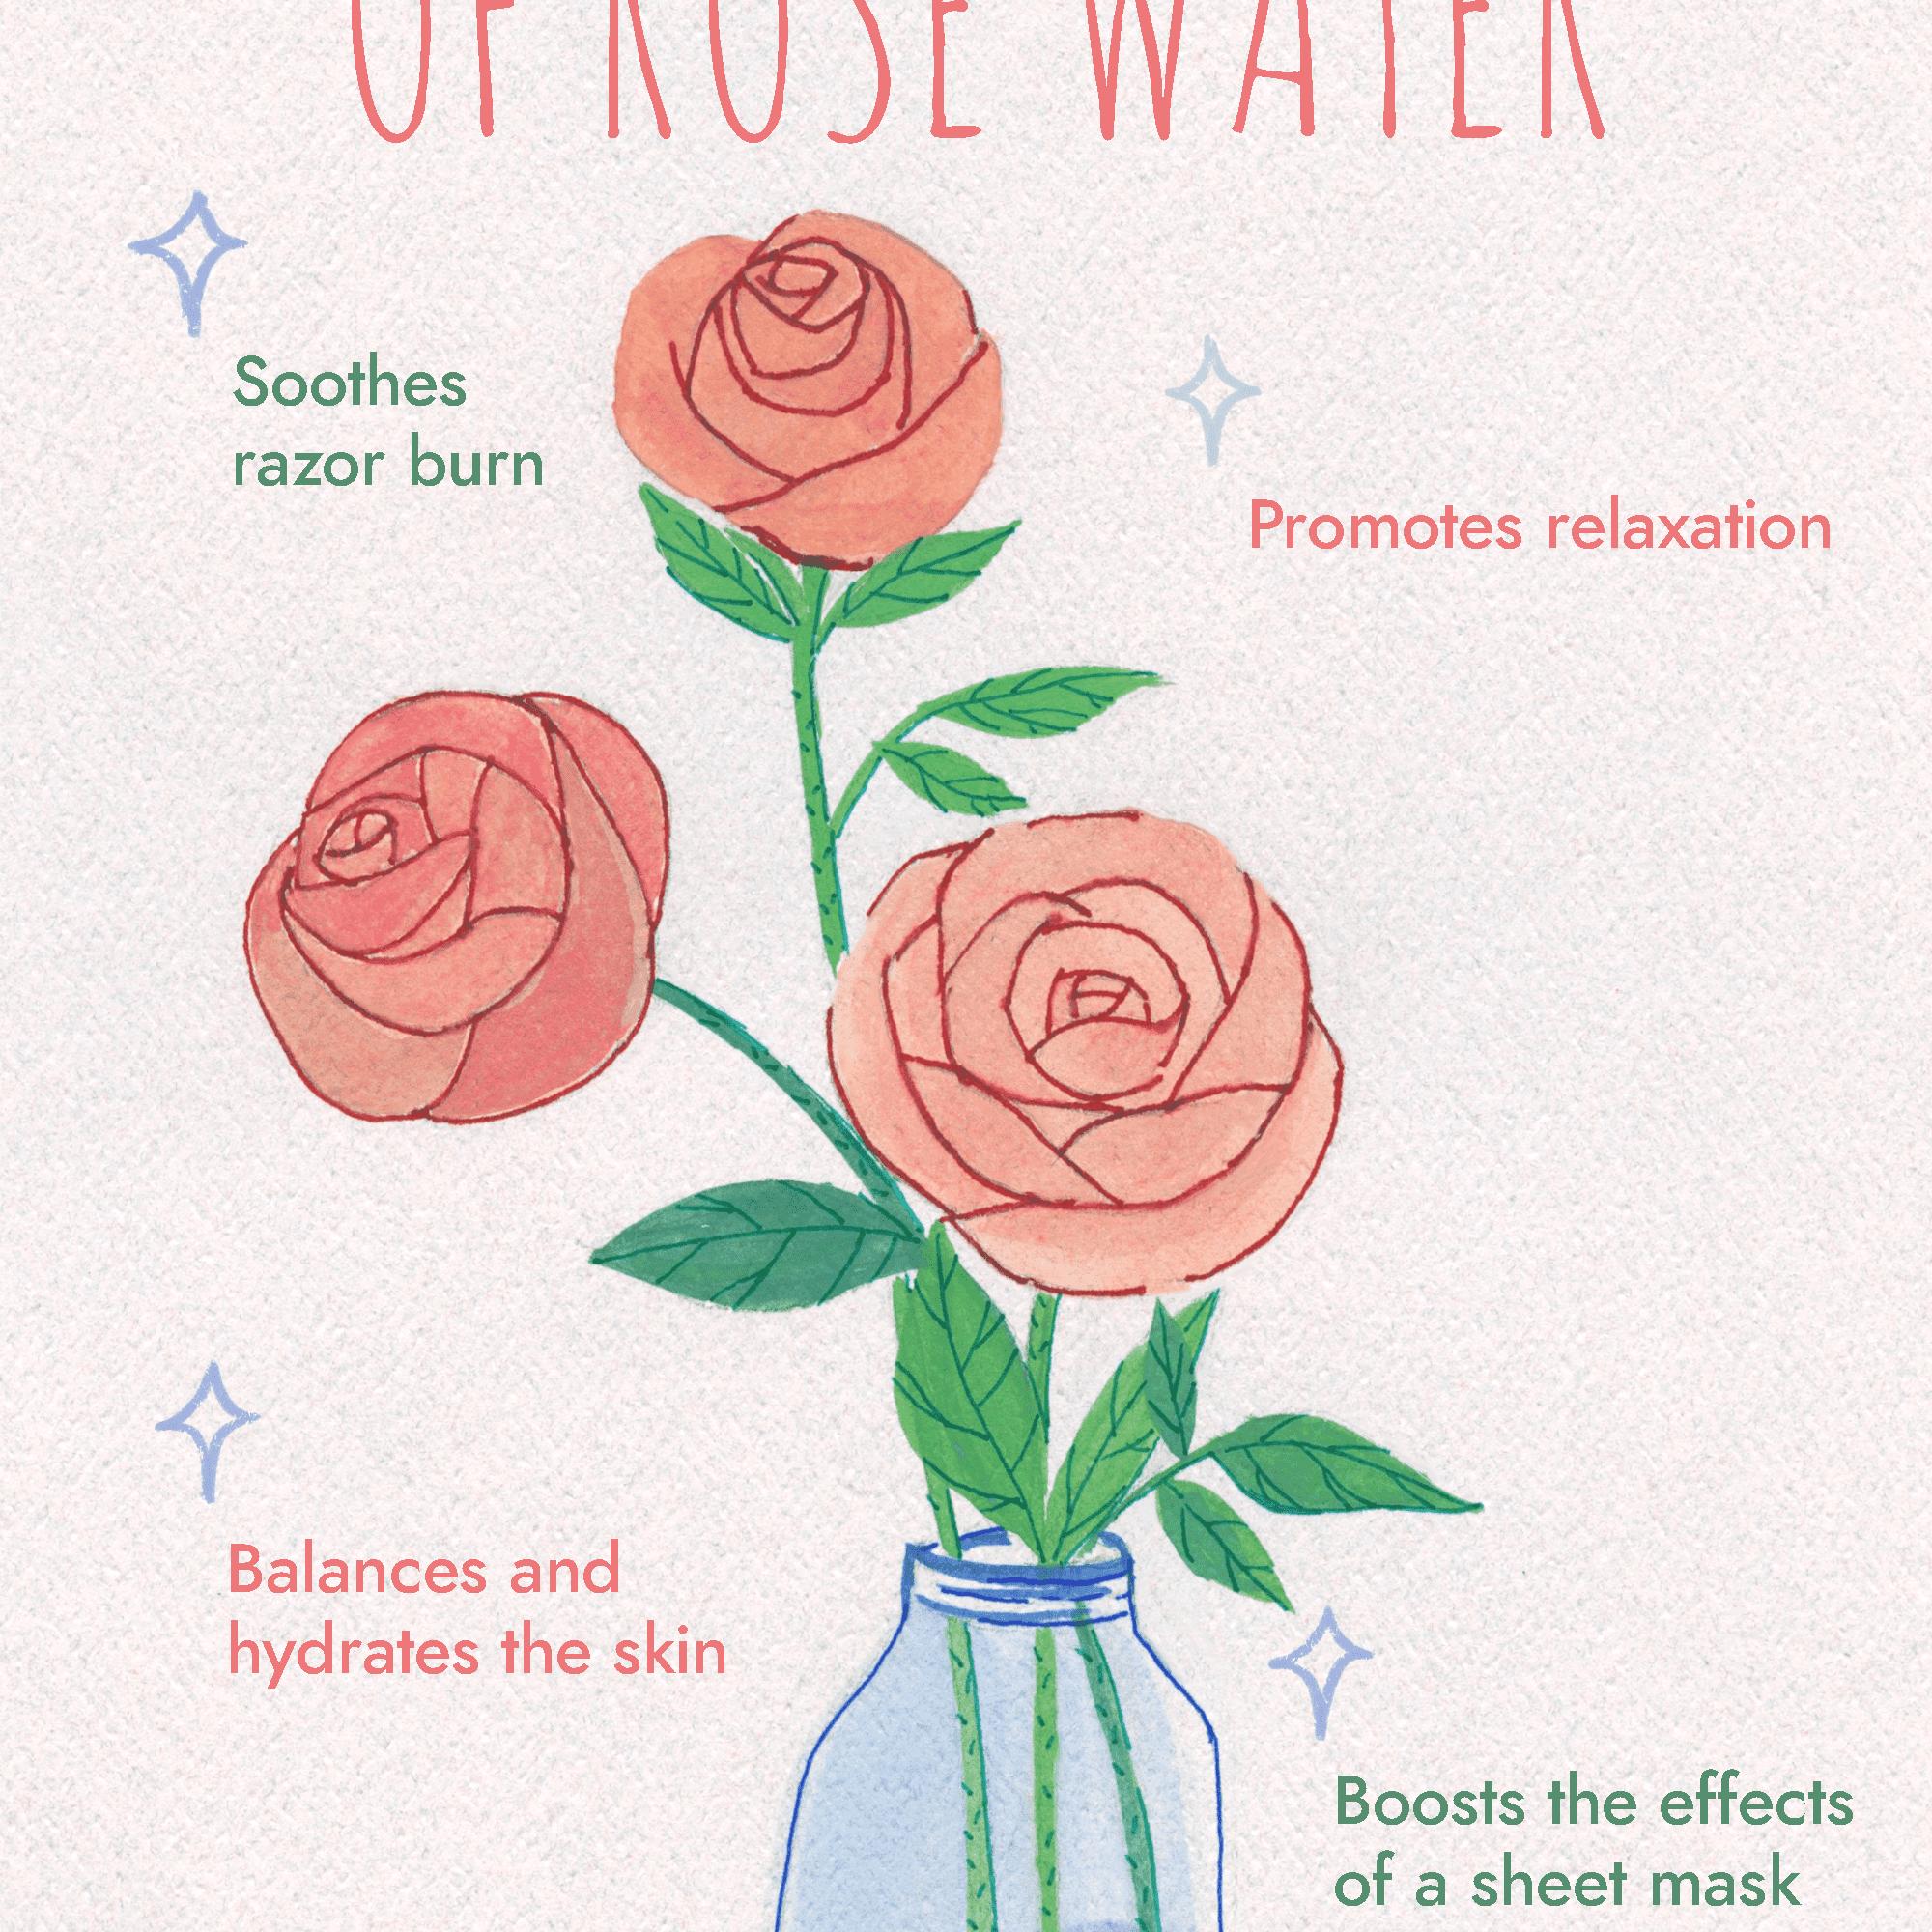 Red Rose Flower Benefits